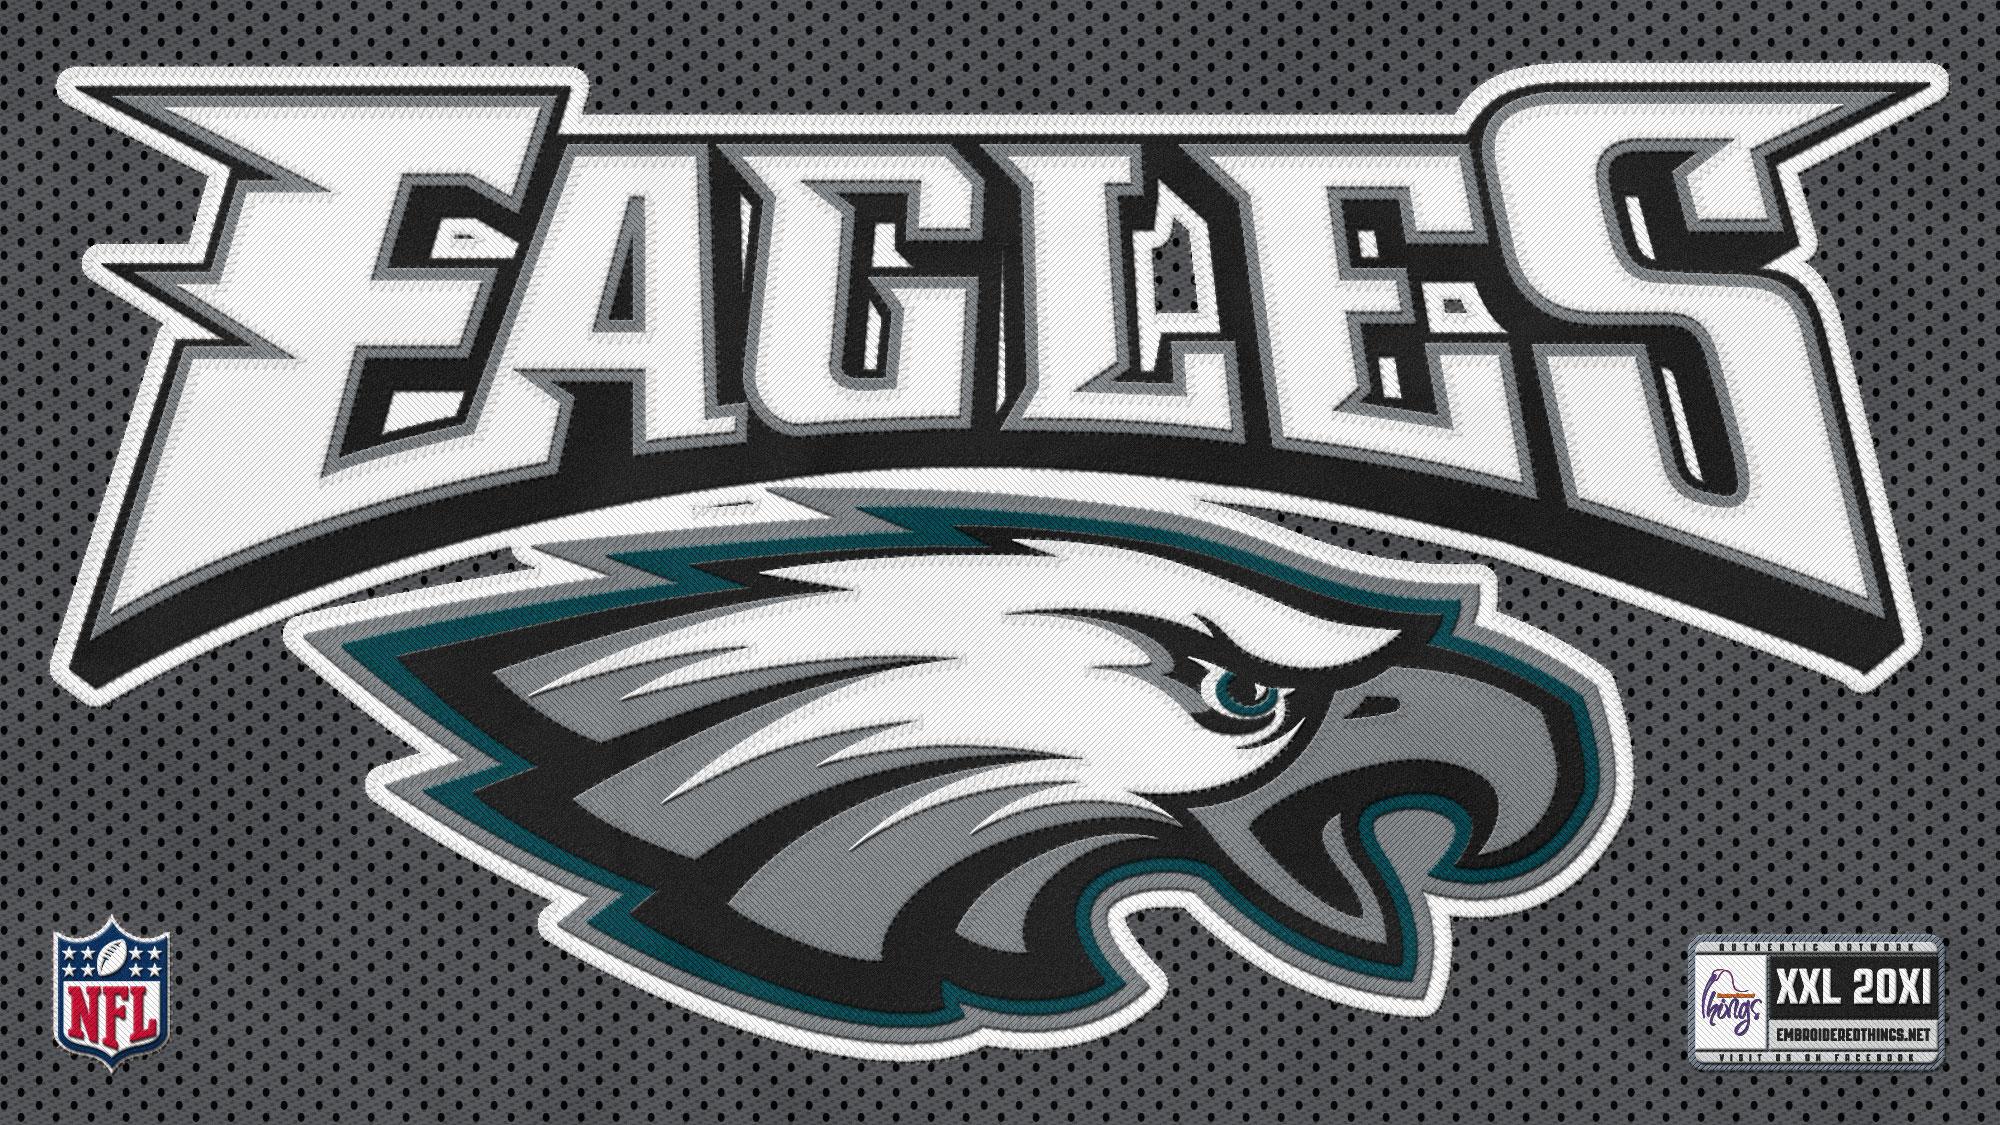 Philadelphia Eagles Logo HD Desktop Wallpaper HD Desktop Wallpaper 2000x1125